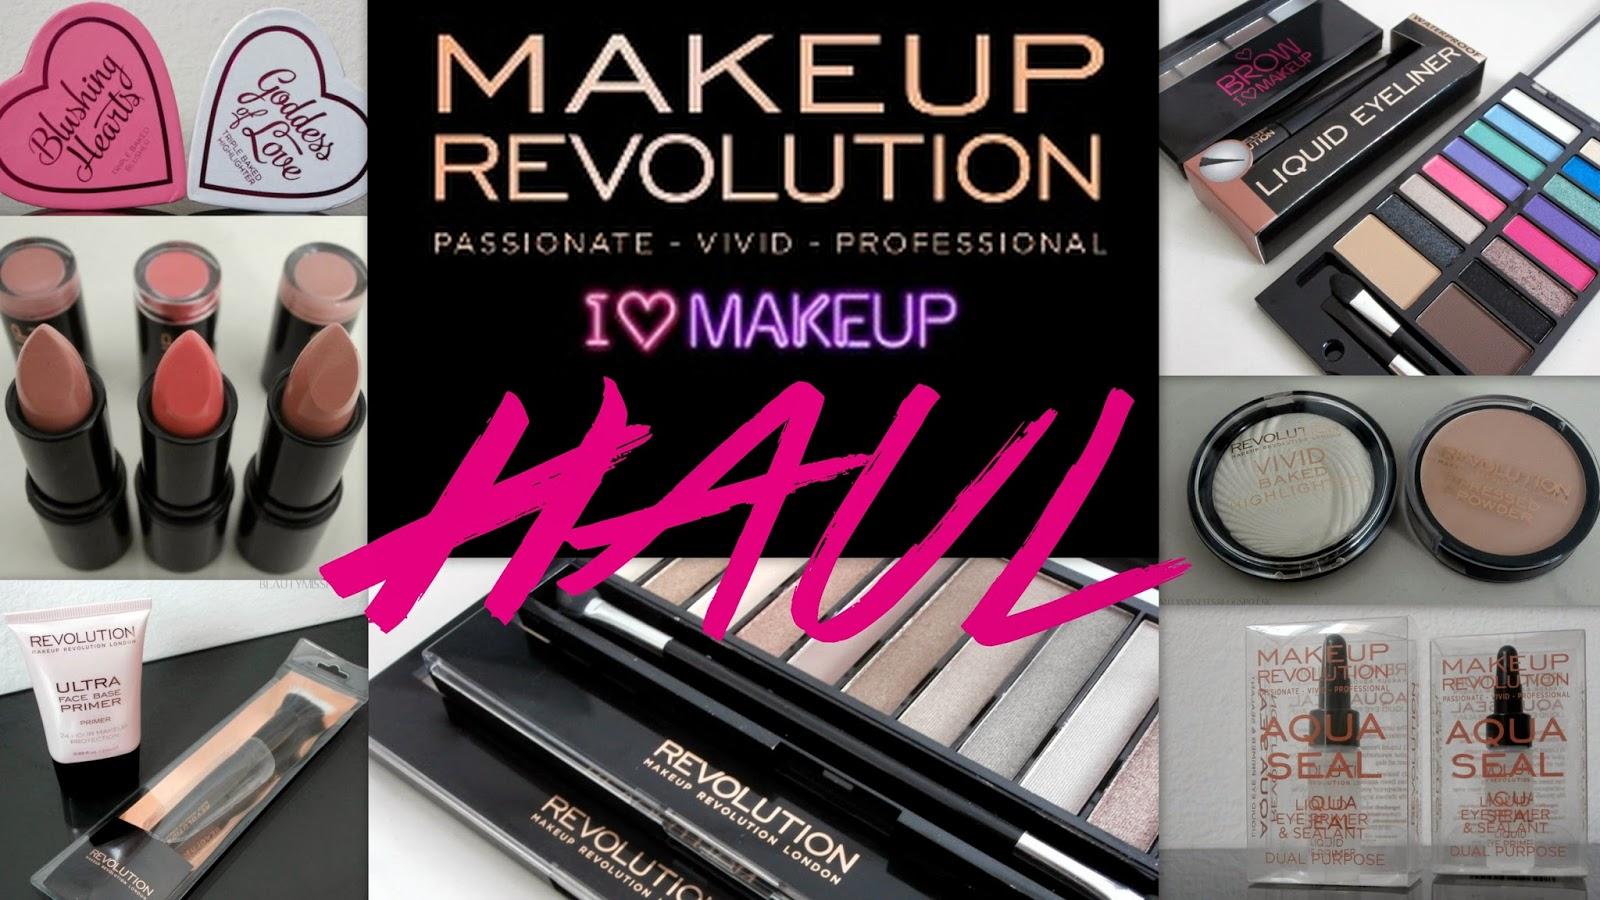 Double HAUL / NEW IN - Makeup Revolution